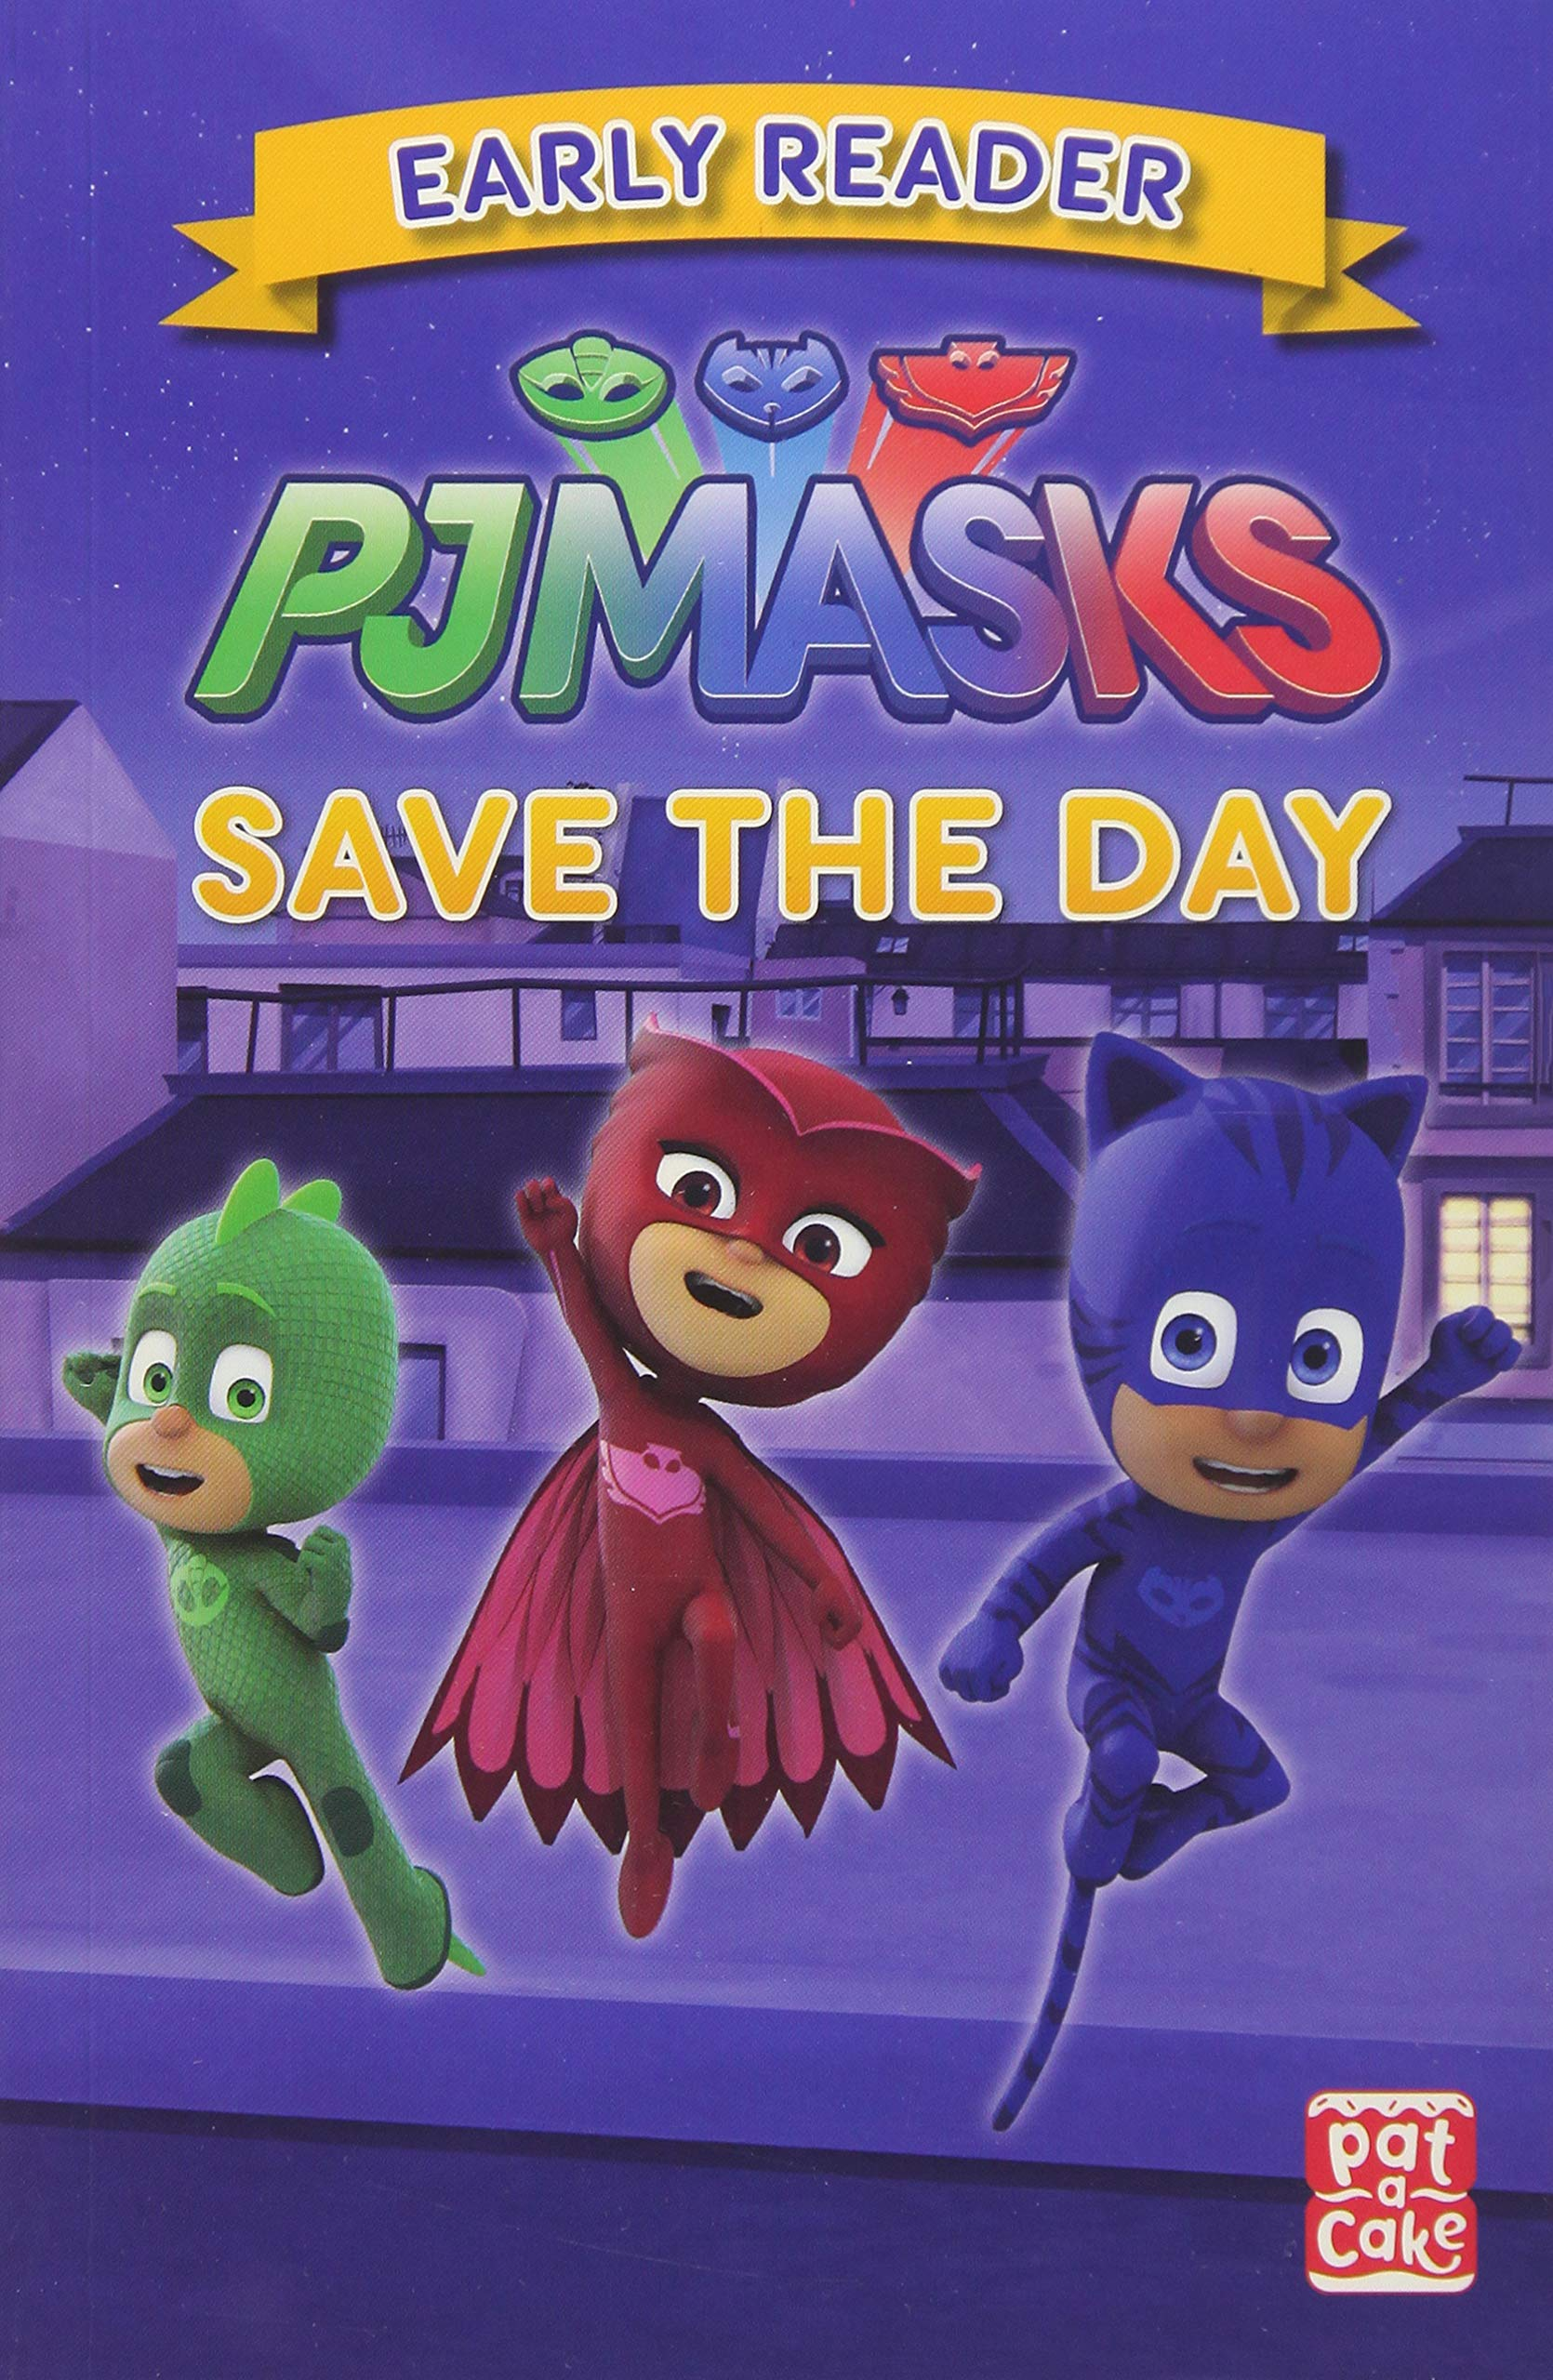 Save the Day: Early Reader (PJ Masks) : Pat-a-Cake, PJ Masks ...